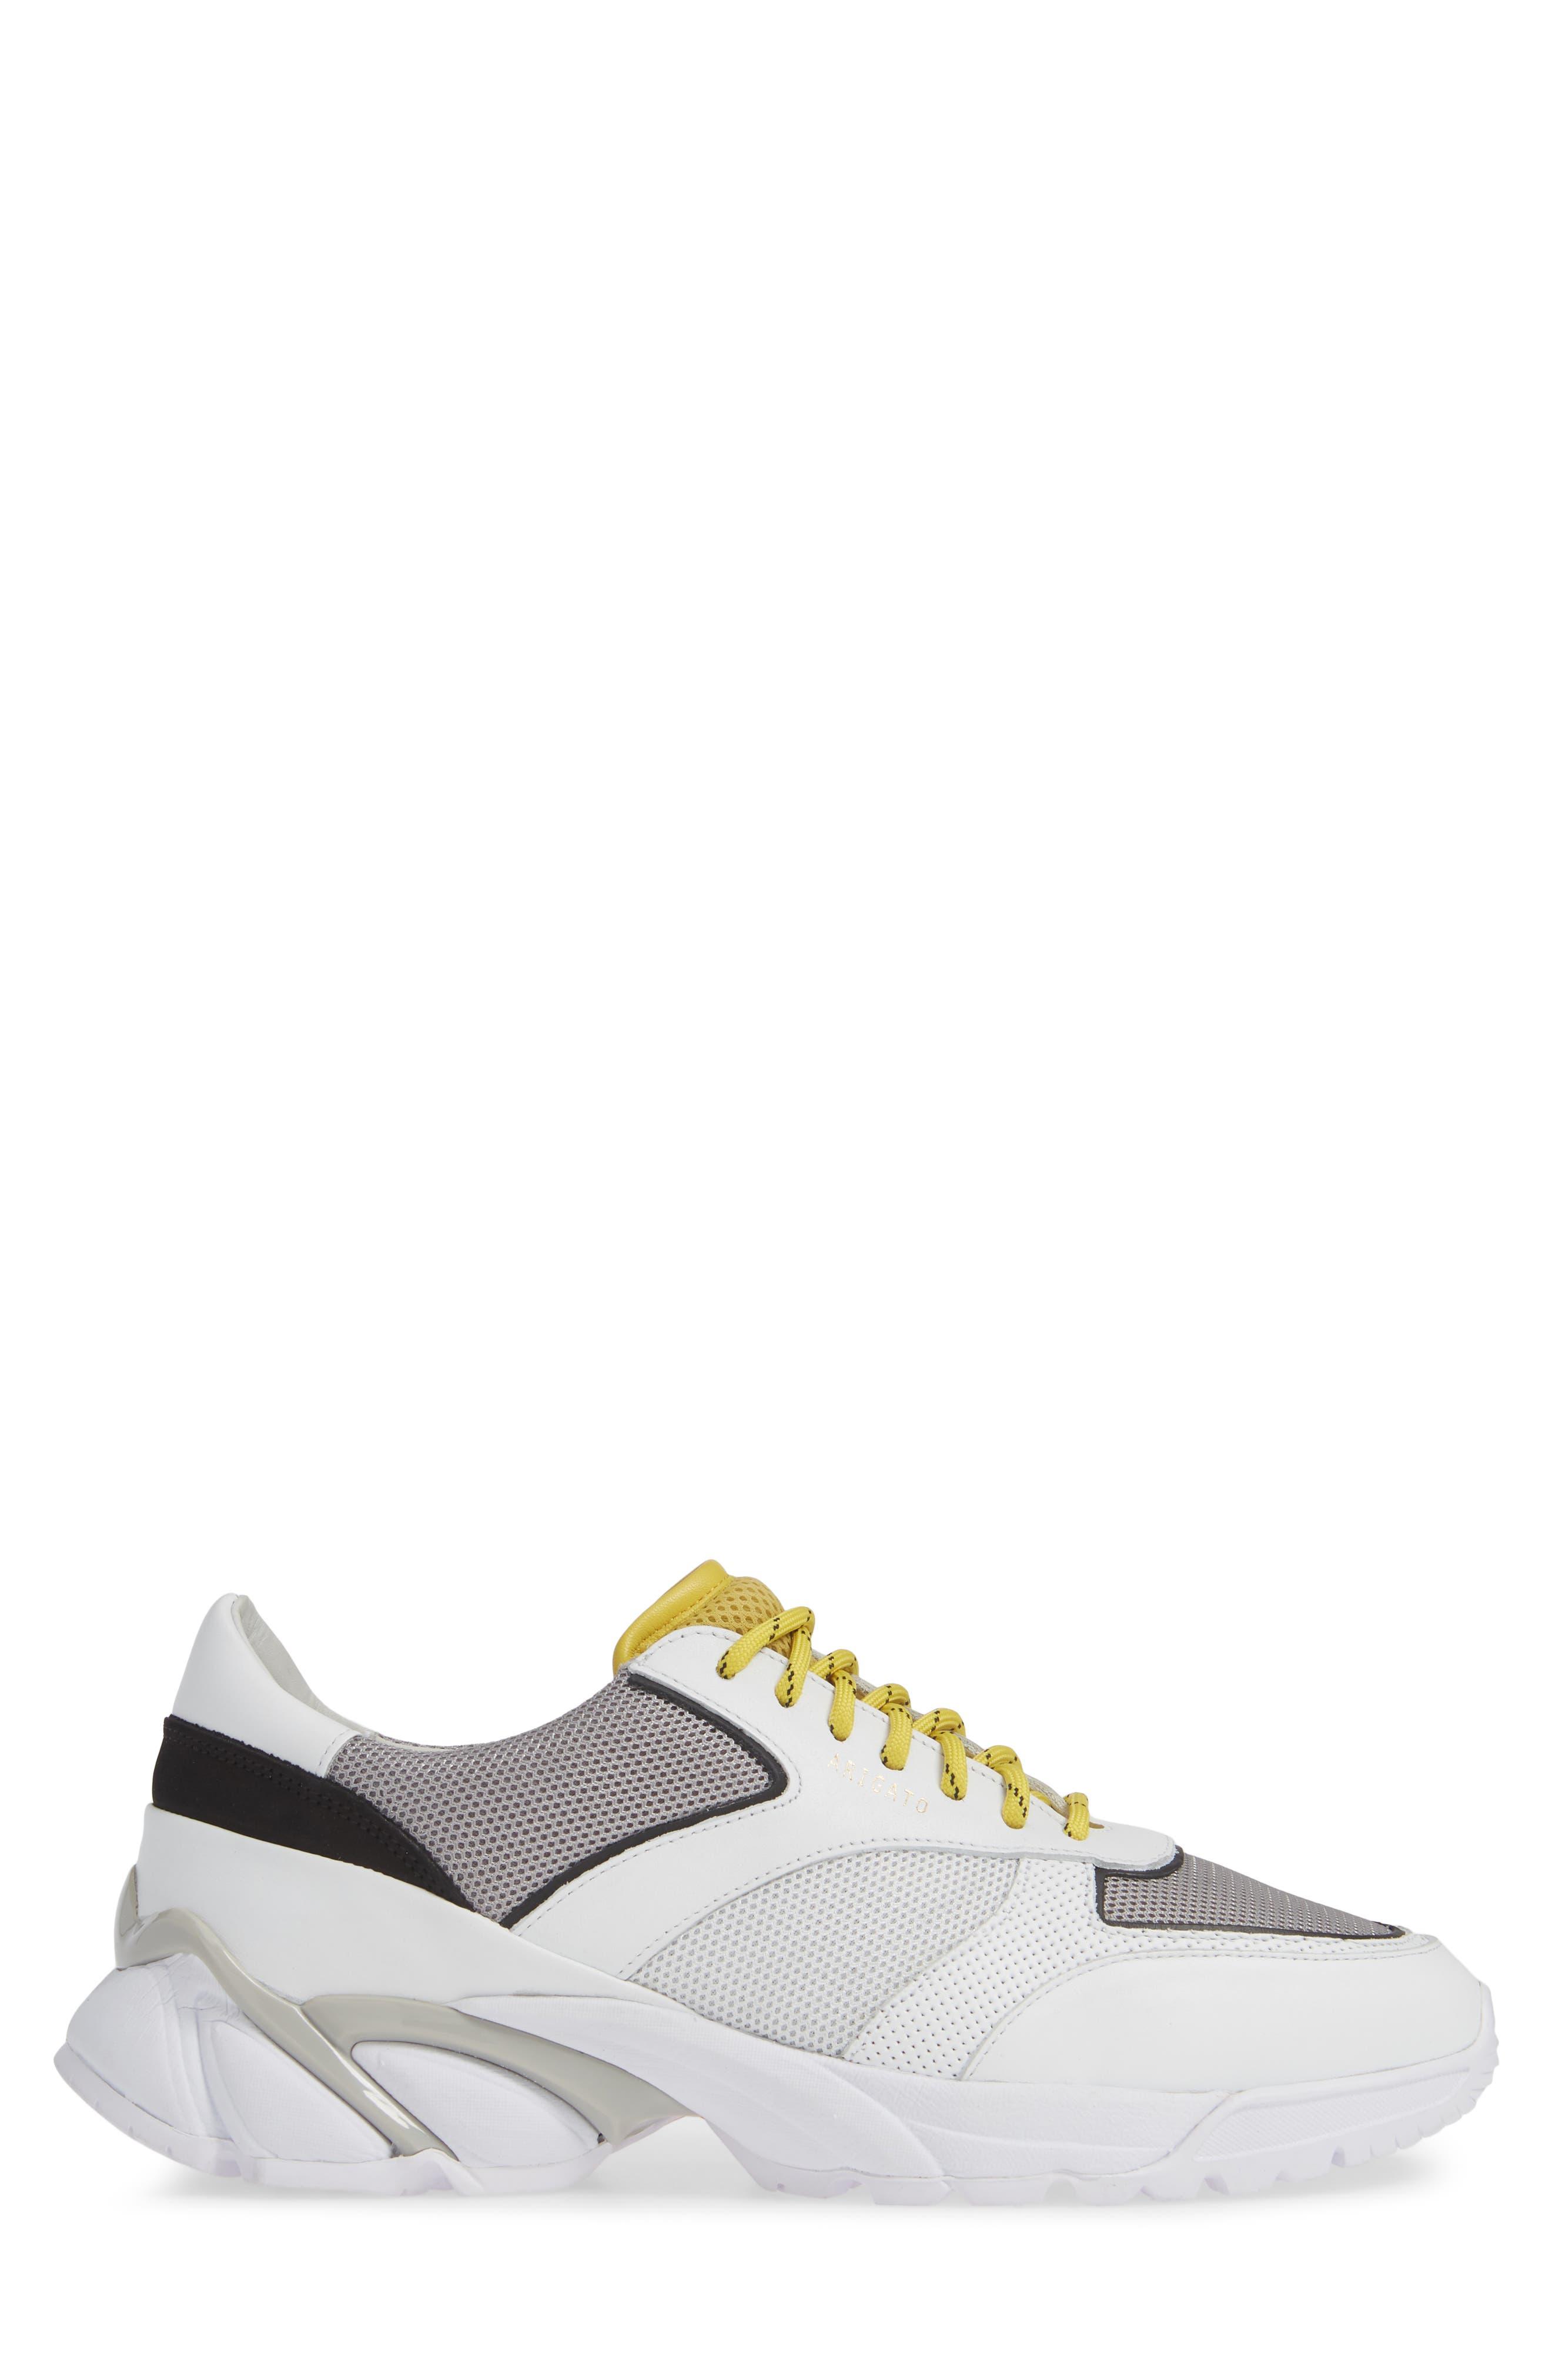 Tech Sneaker,                             Alternate thumbnail 3, color,                             100